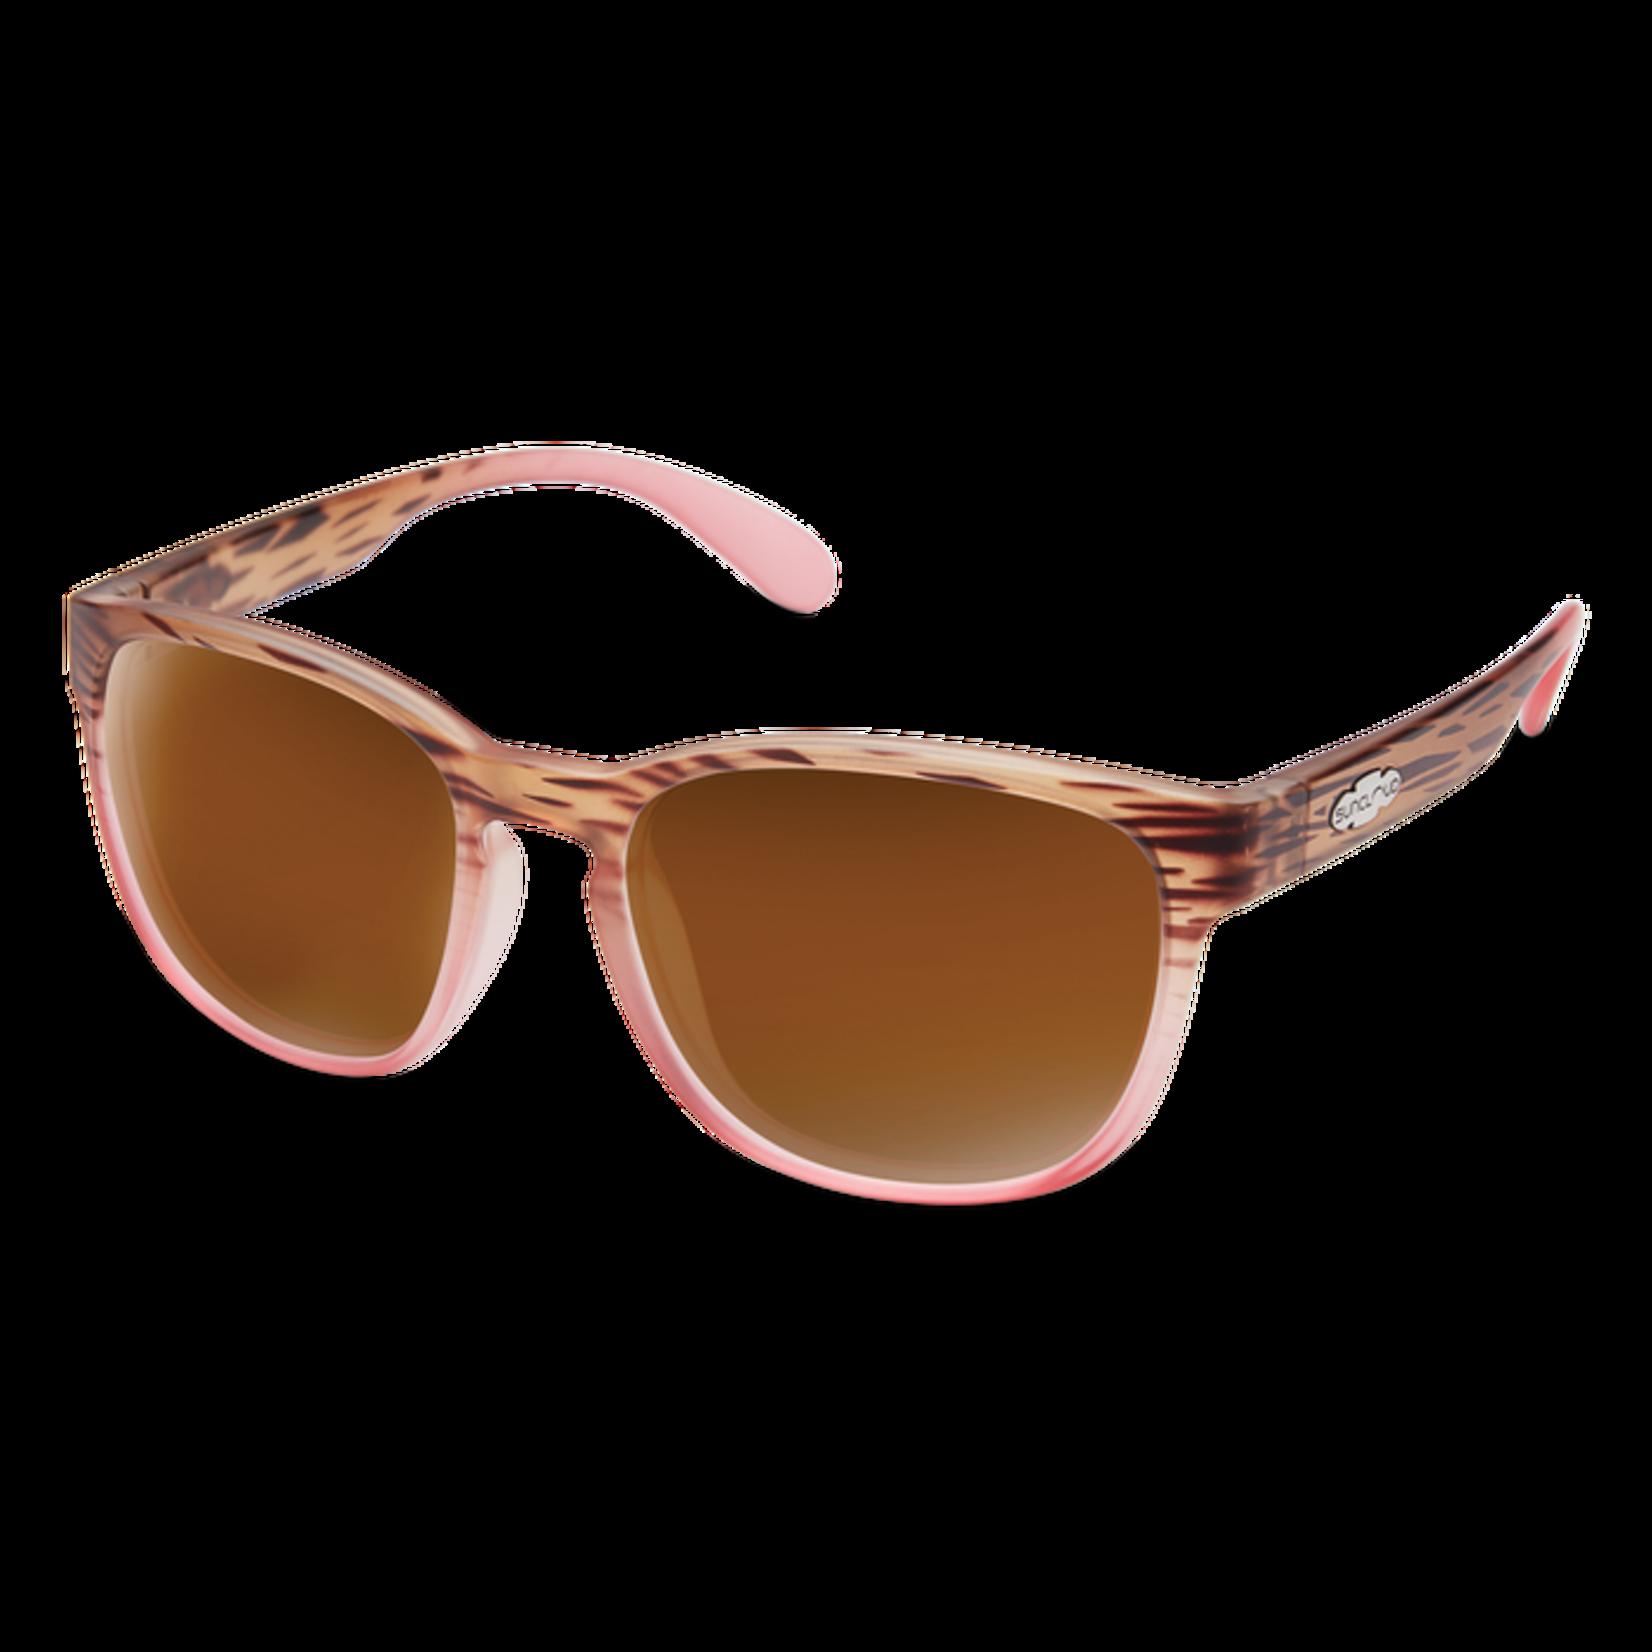 Suncloud Optics Suncloud Loveseat Polarized Sunglasses